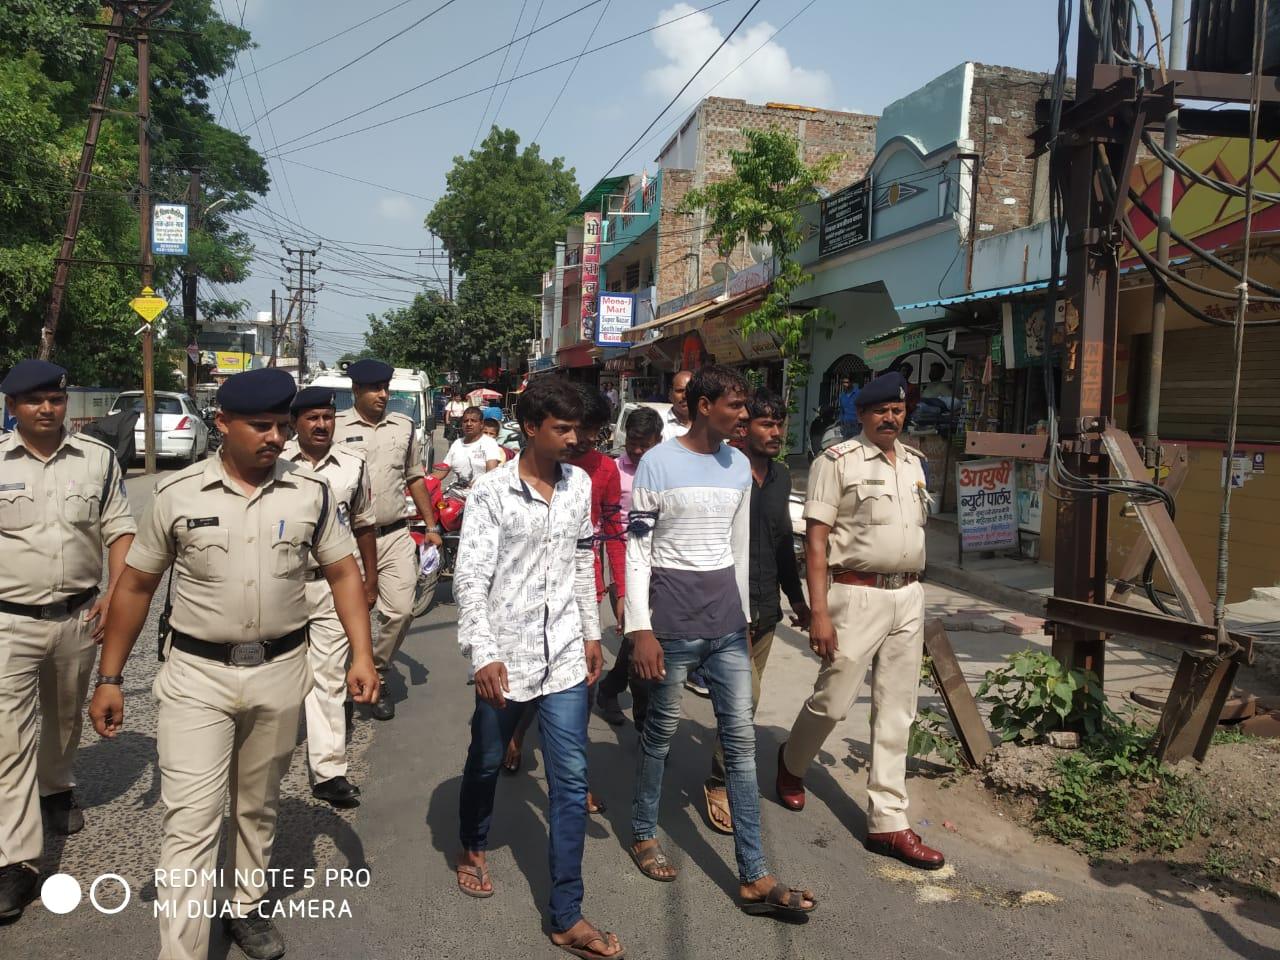 Indore News- 4-criminal-arrested-for-planning-robbery-डकैती की योजना बनाते 4 शातिर बदमाश गिरफ्तार